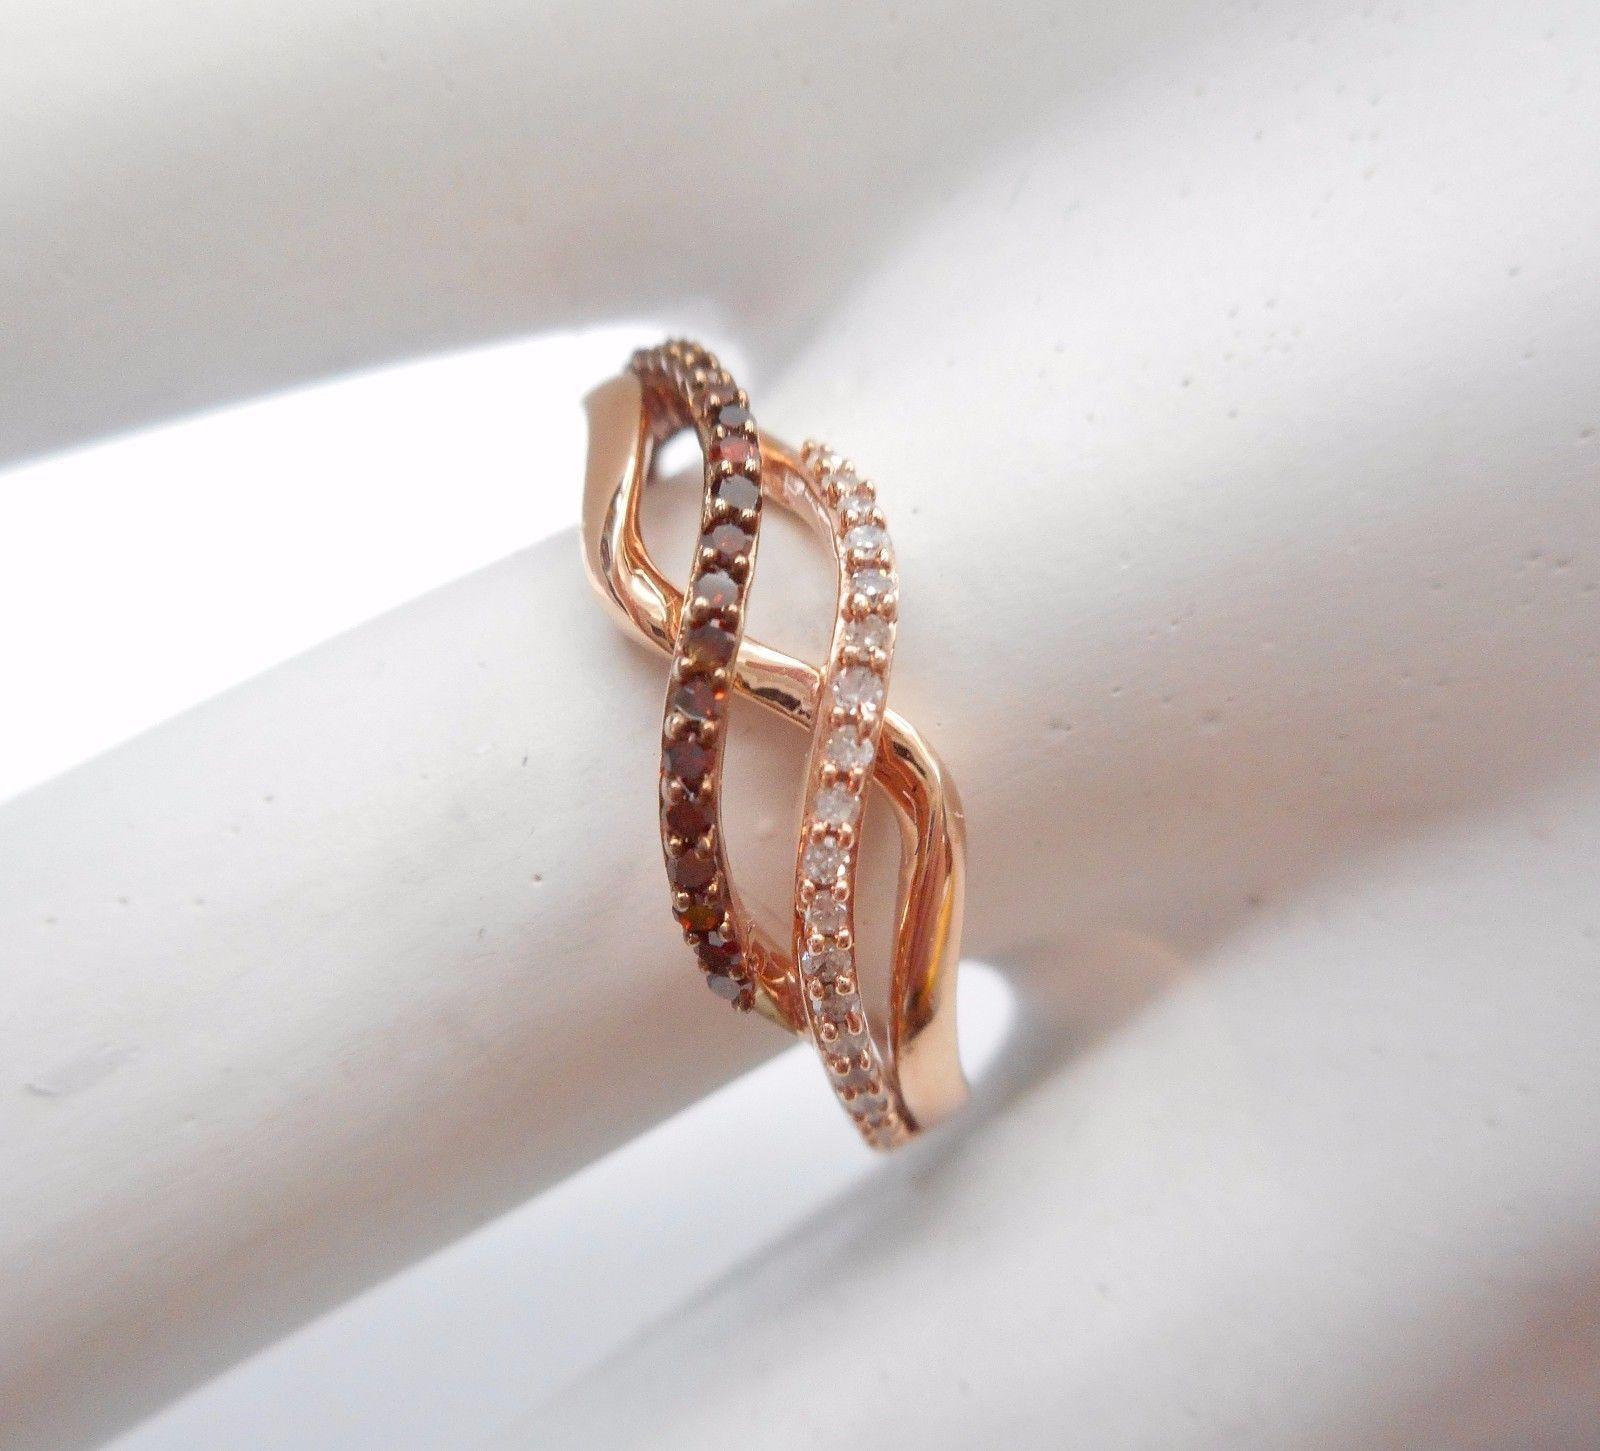 JWBR Kay's 10k Rose Gold Brown & White Diamond Accent .20 TCW Band Ring #2363